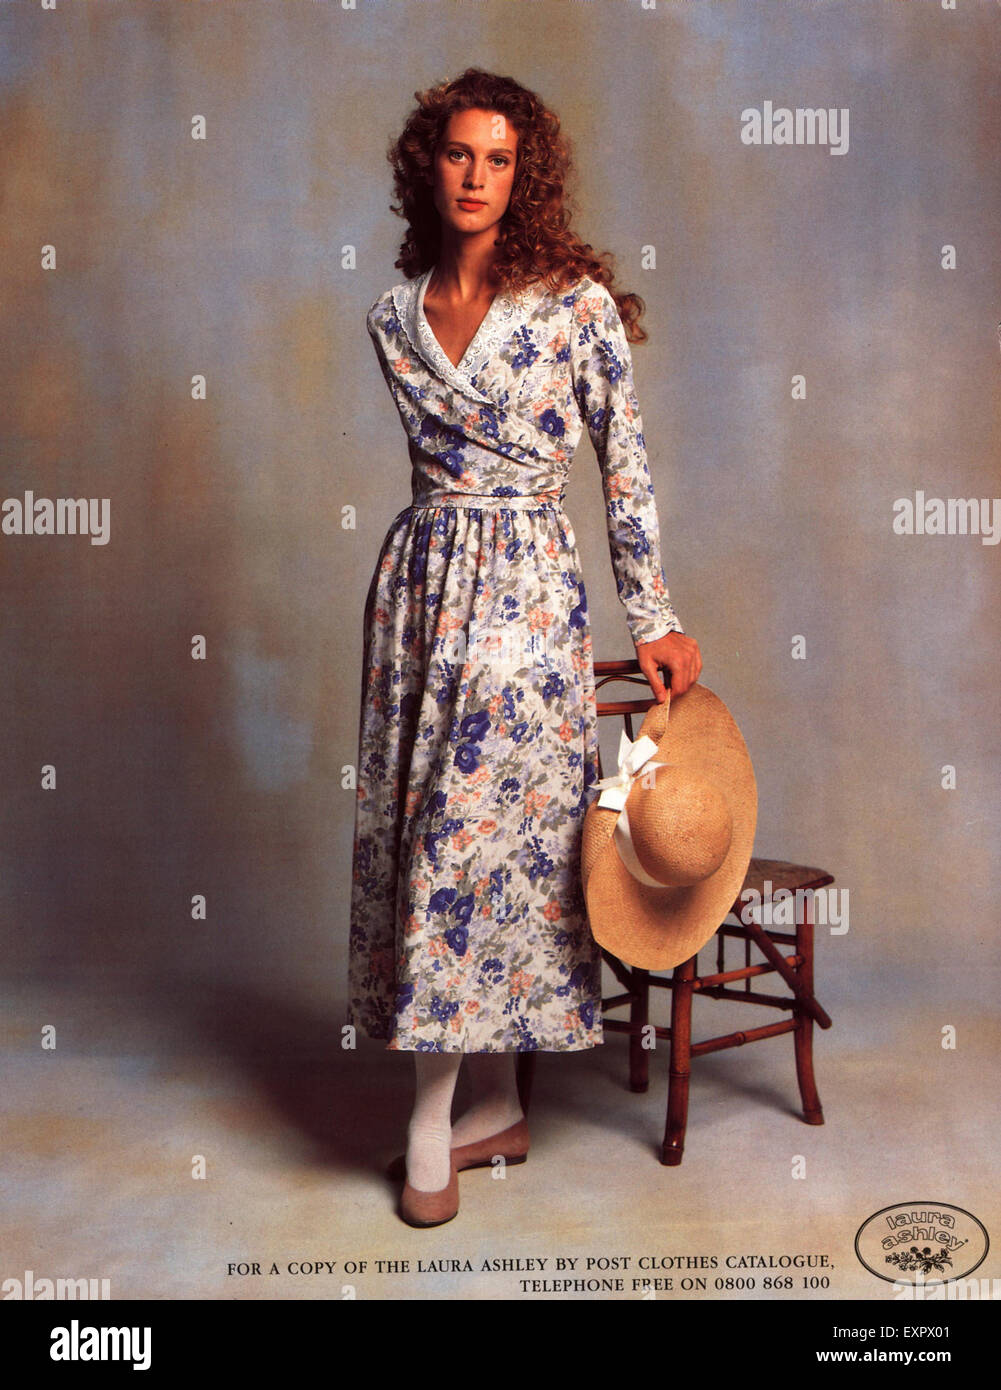 Laura Ashley Clothing for Women